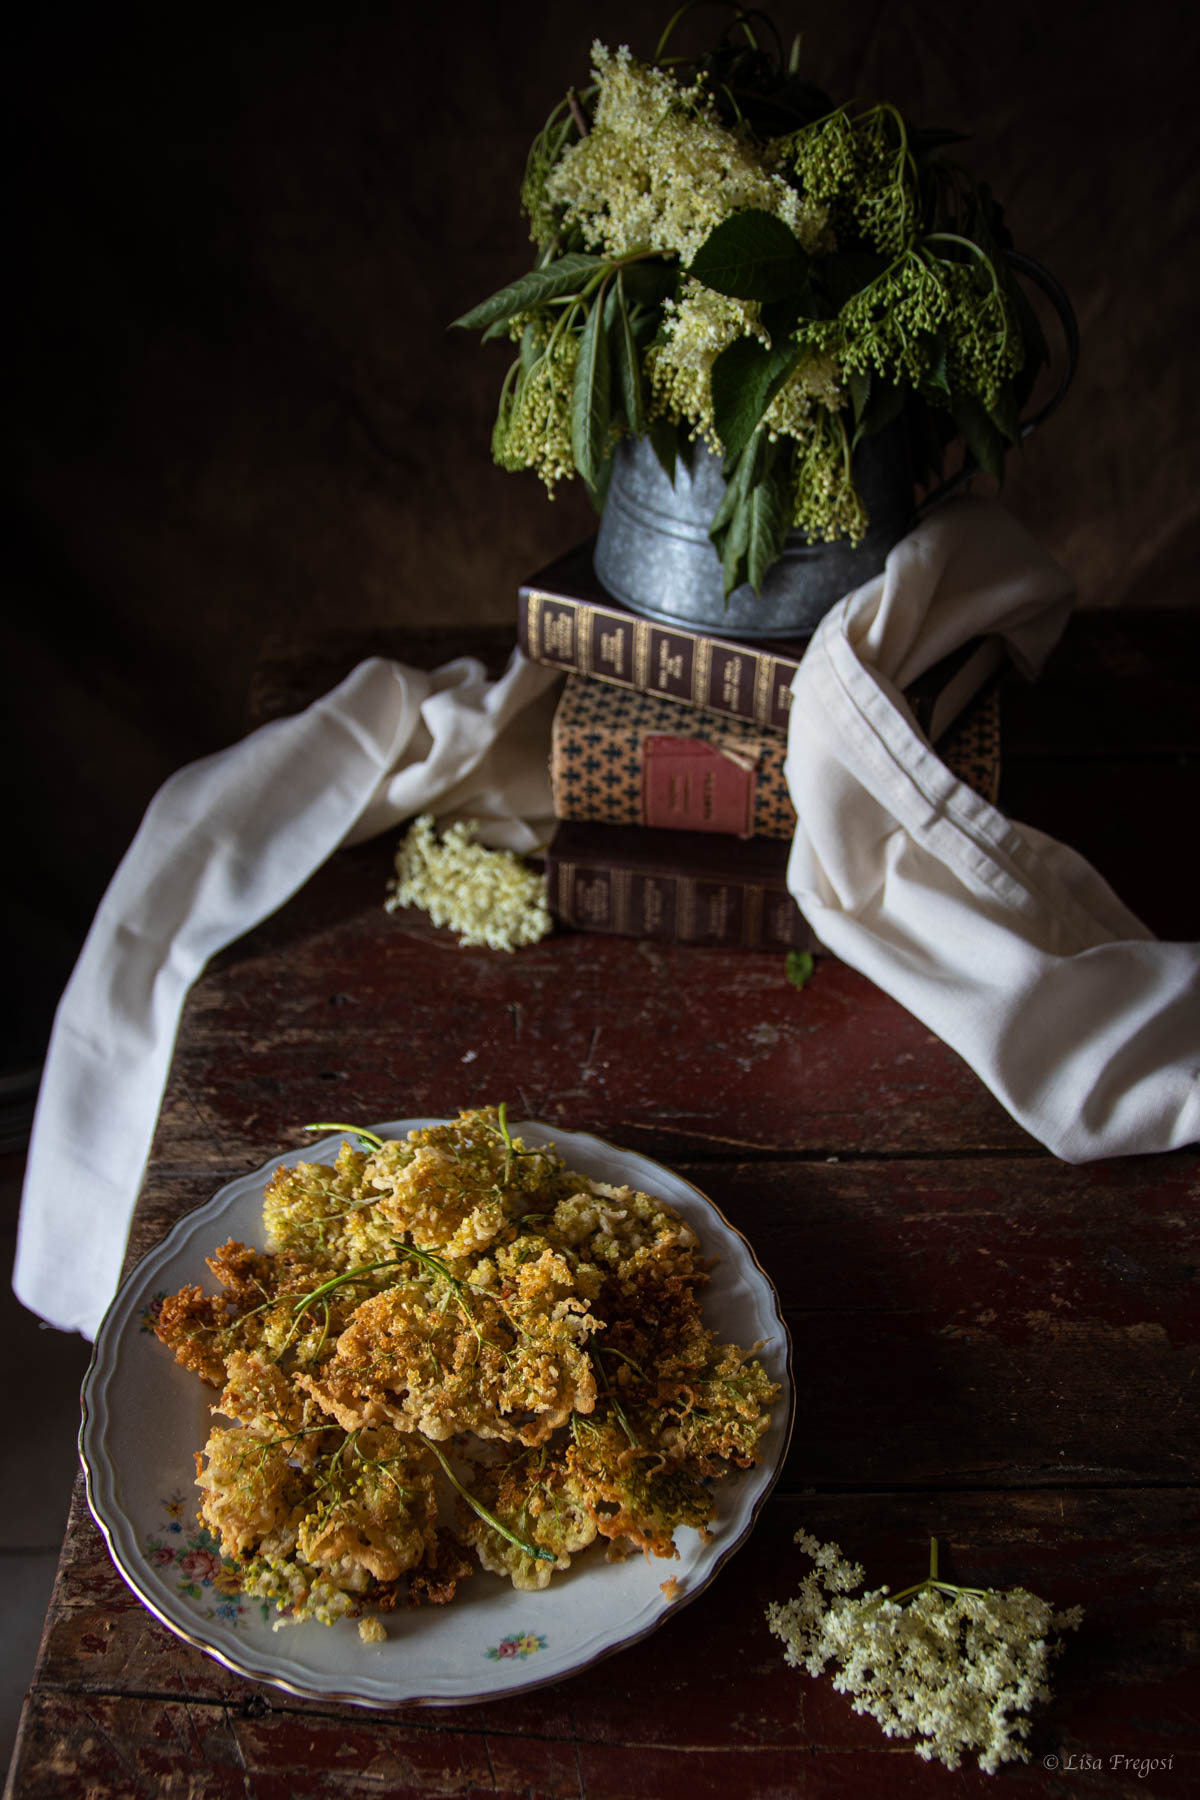 frittelle fiori di sambuco, frittelle ai fiori di sambuco, frittelle con i fiori di sambuco,